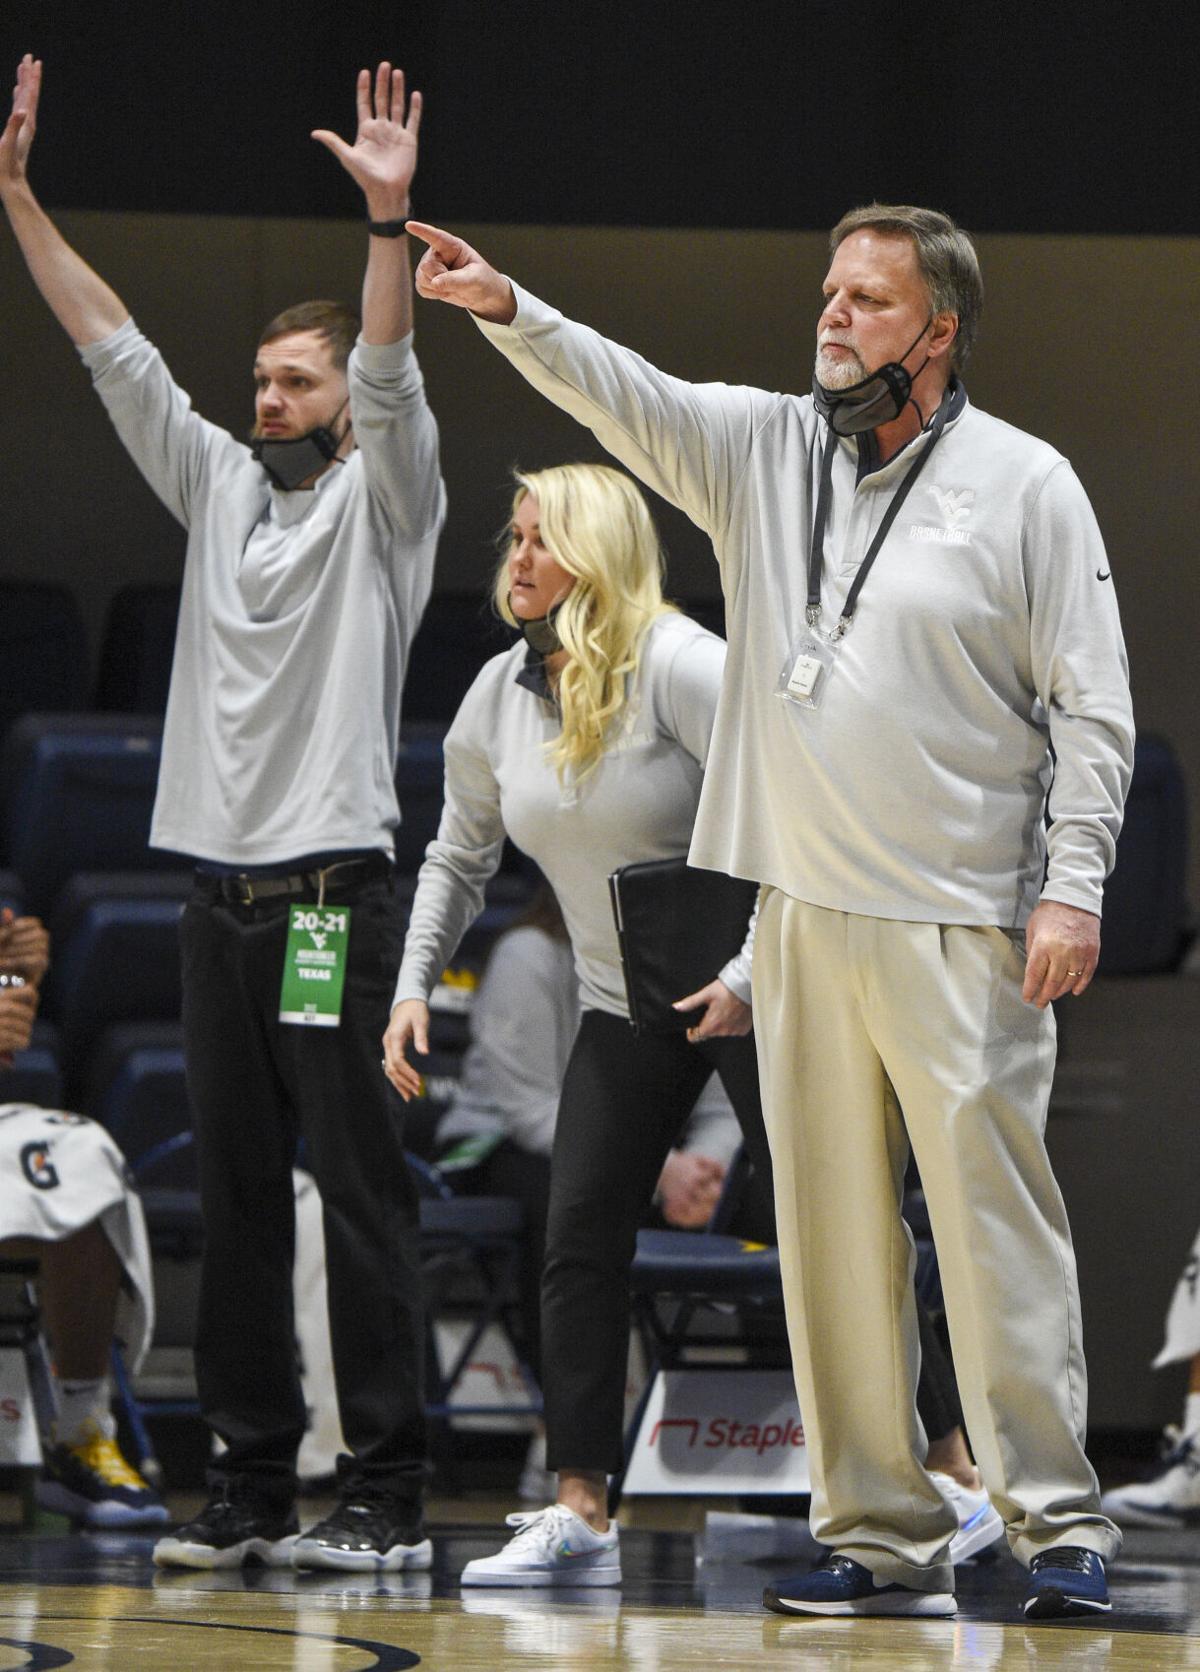 West Virginia women's basketball head coach Mike Carey leads his team against the Texas Longhorns, at the WVU Coliseum in Morgantown, W.Va., Jan. 9, 2021.